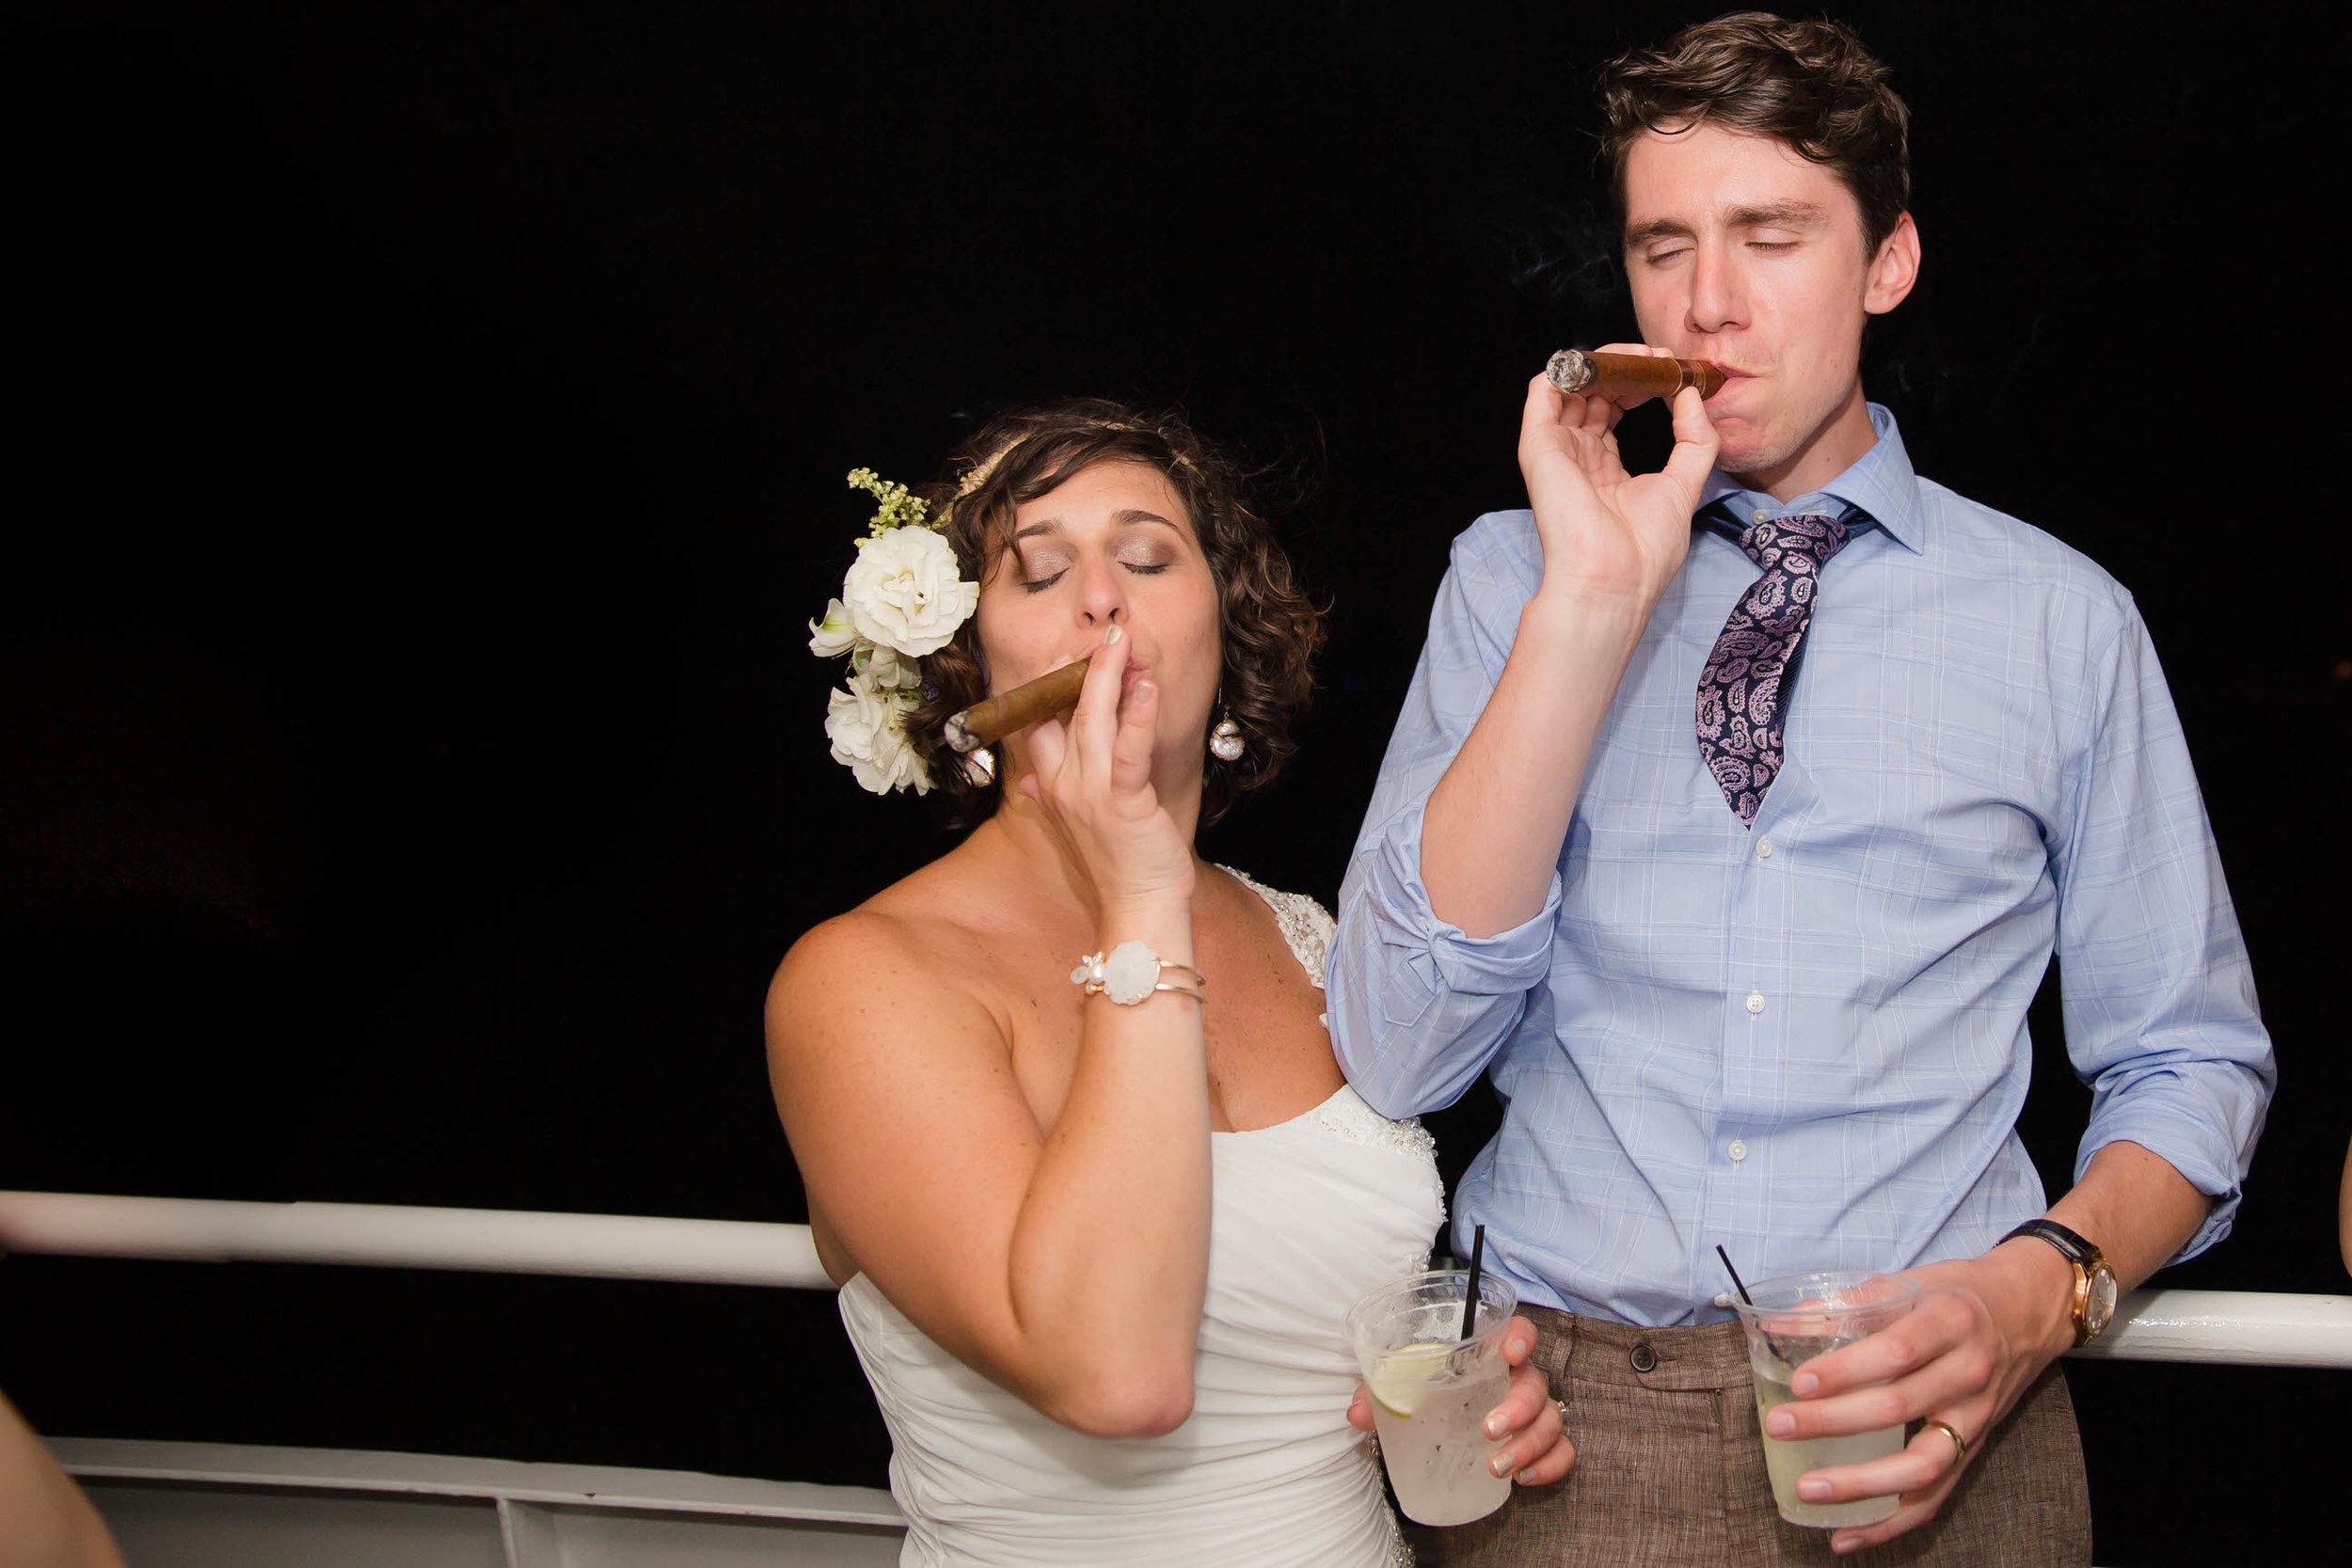 bride-groom-cigars-tiny-house-photo-boat-destination-wedding-florida.jpg